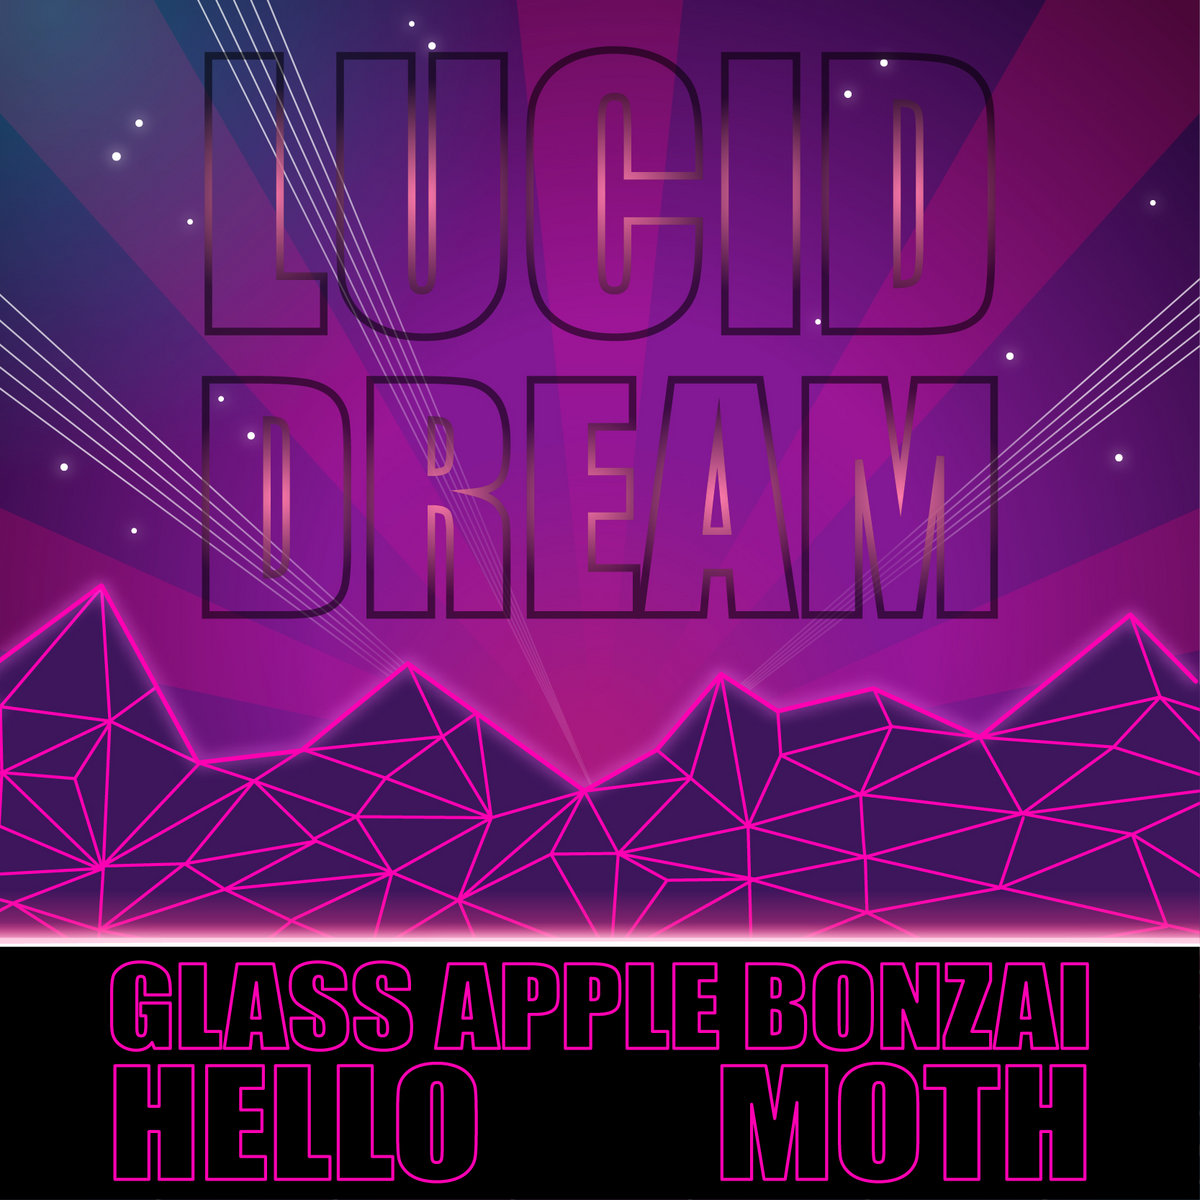 Lucid Dream | Glass Apple Bonzai